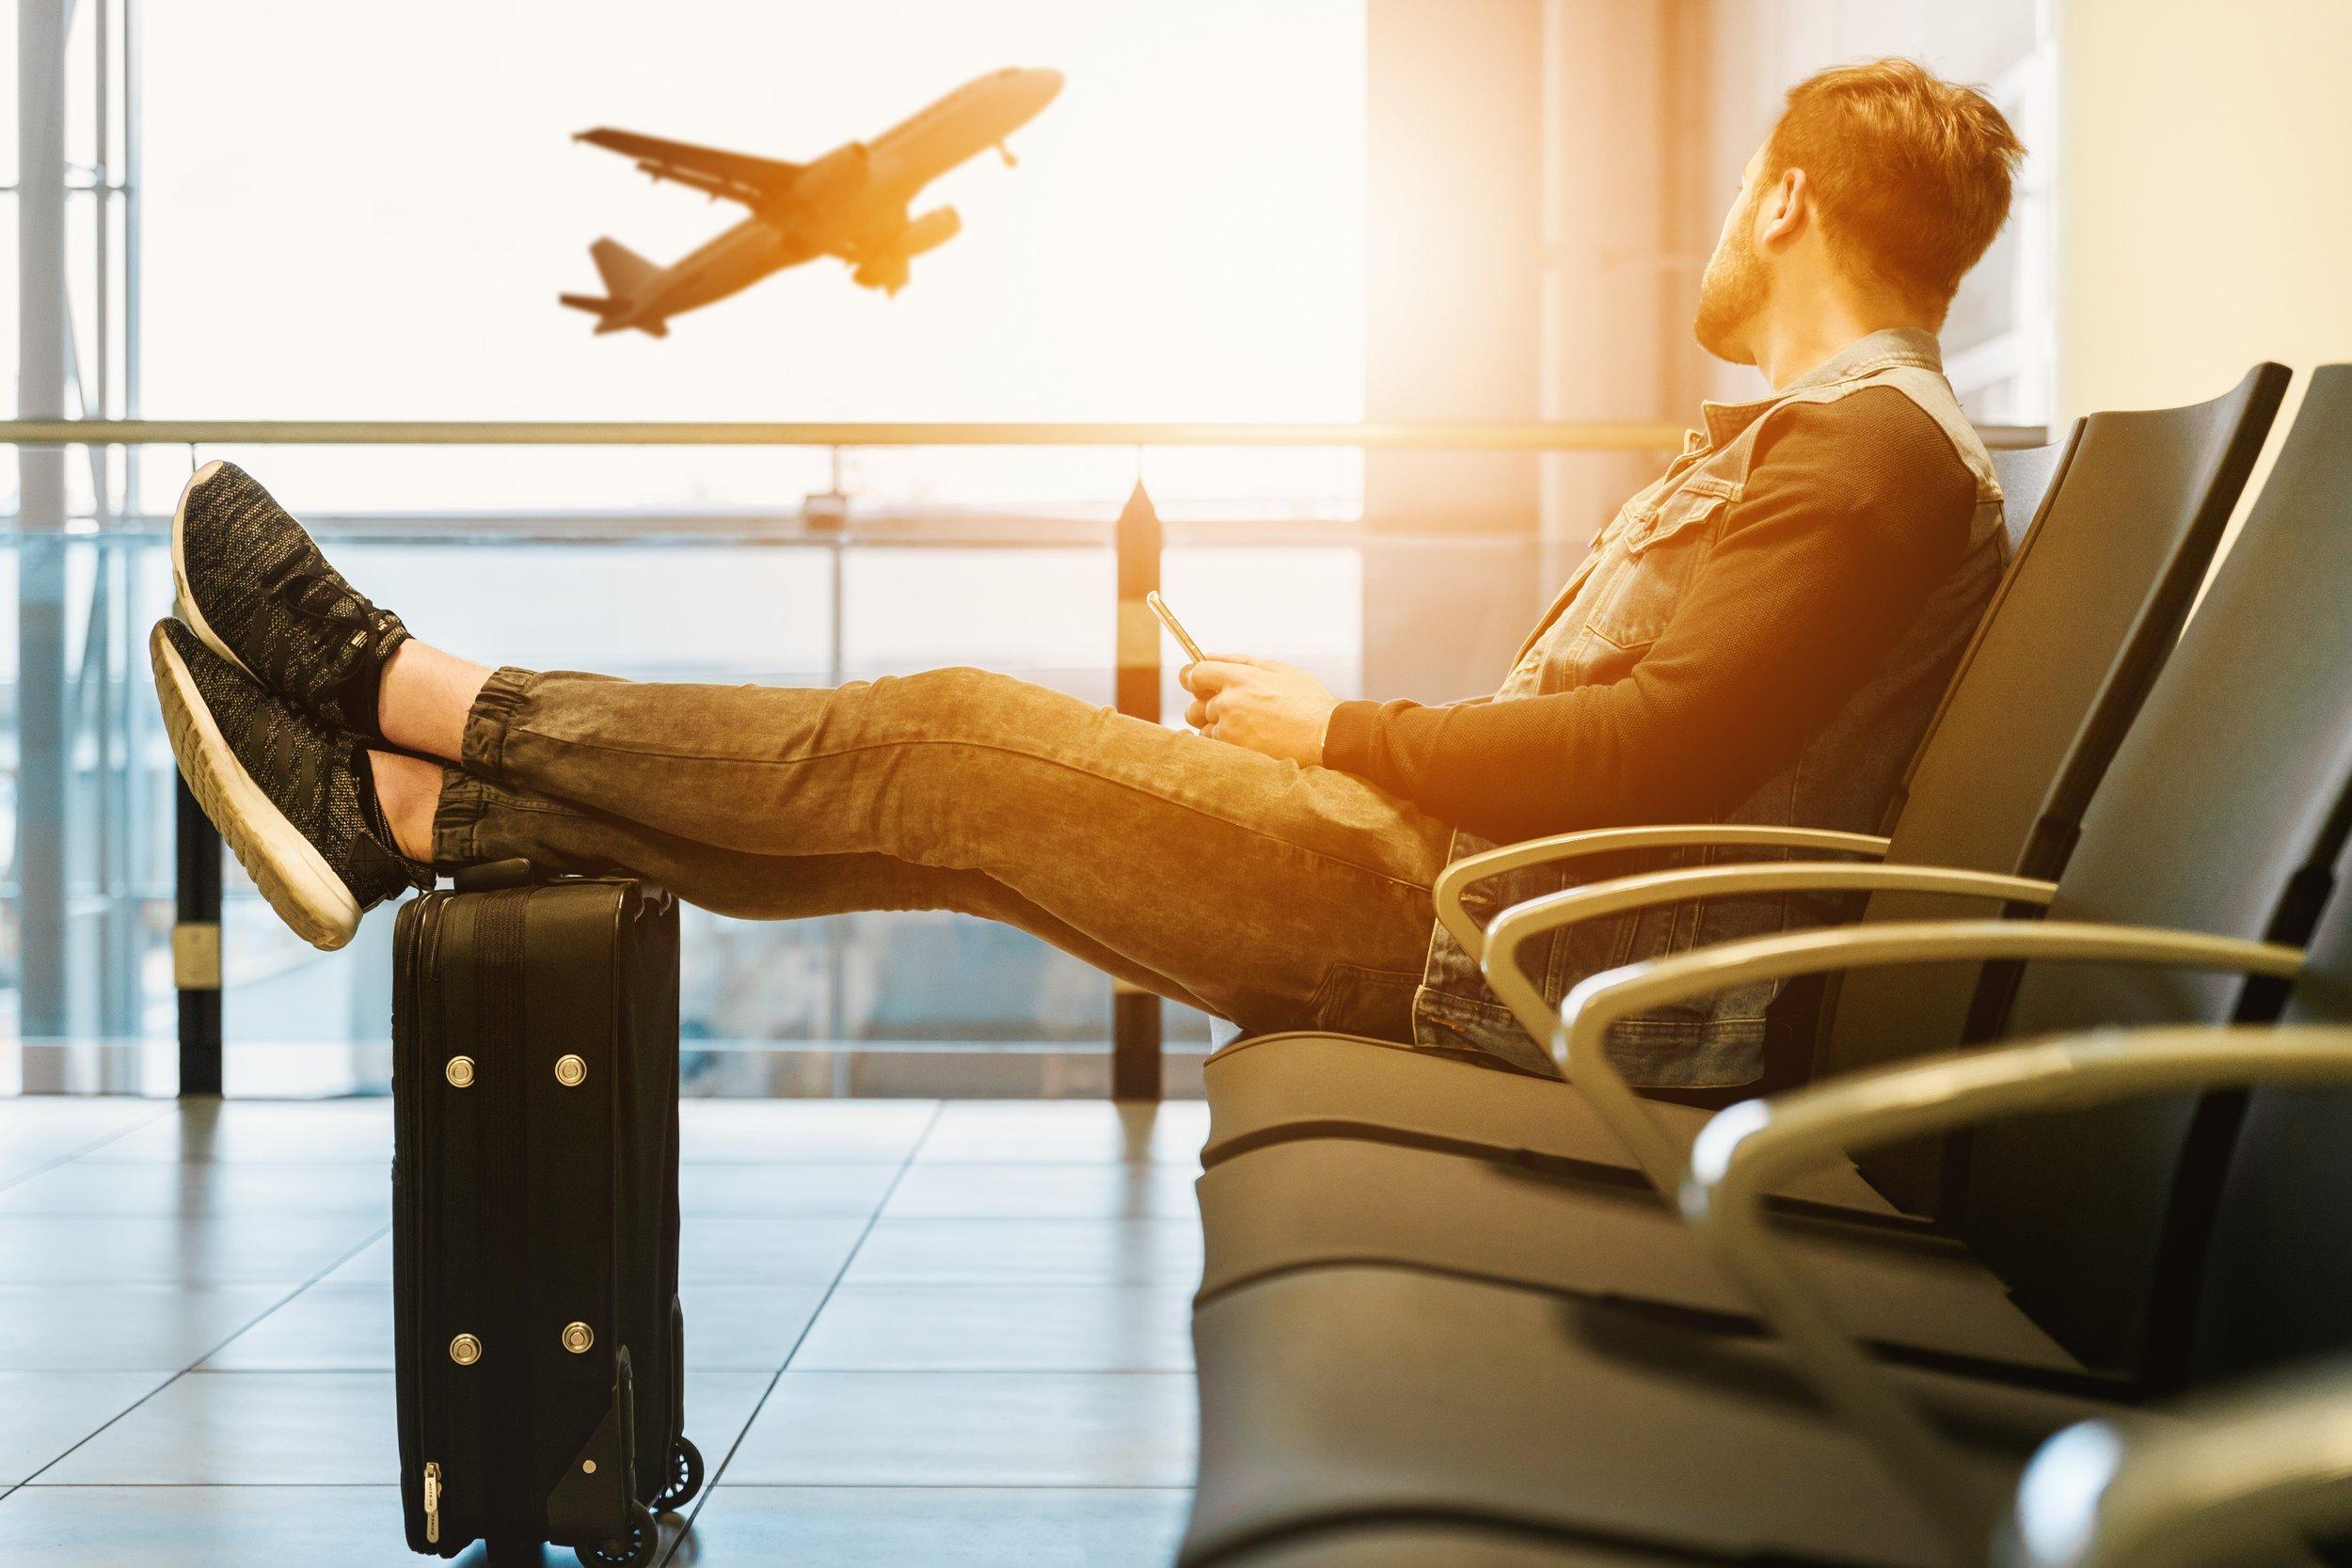 Man, Travel, Plane and Suitcase  JESHOOTS.COM